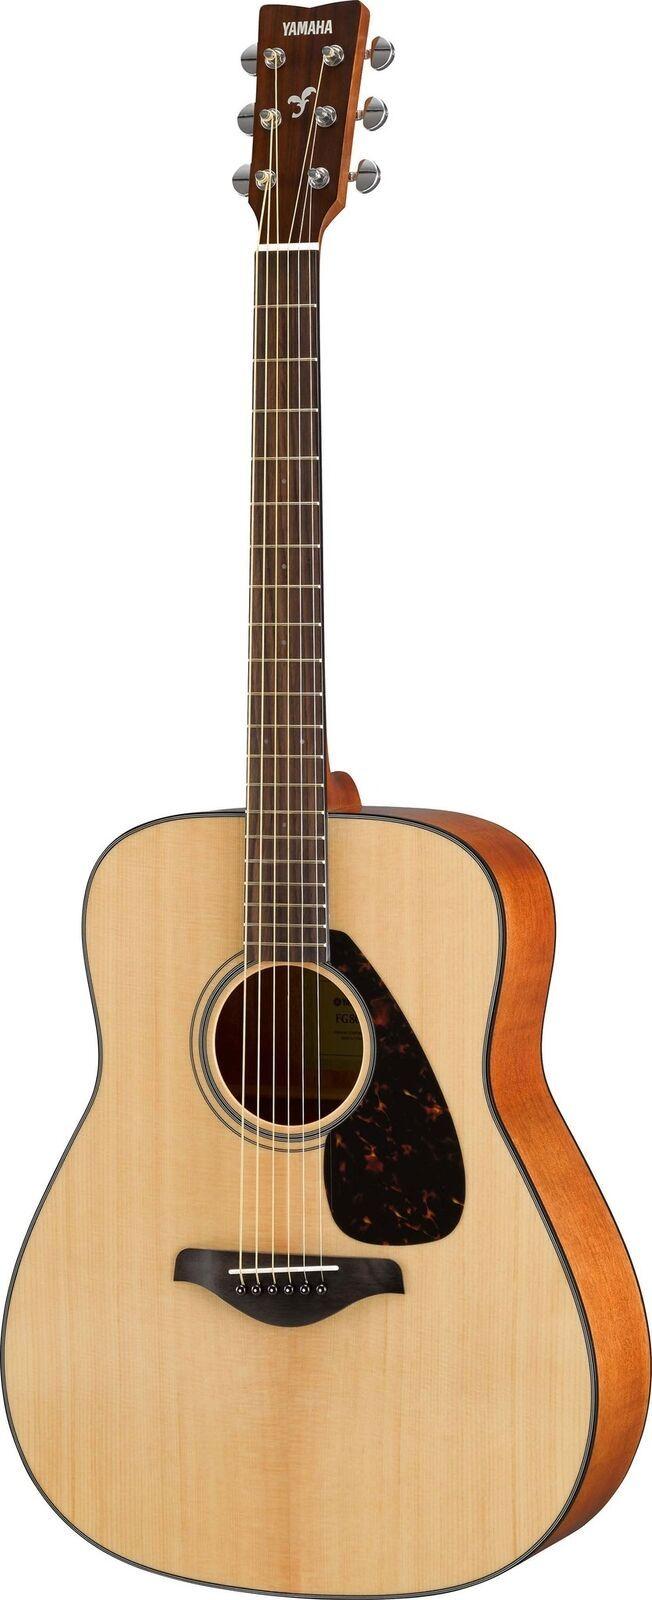 Pin By Shane Greco On Guitars I Own Yamaha Guitar Acoustic Guitar Tattoo Yamaha Guitars Acoustic